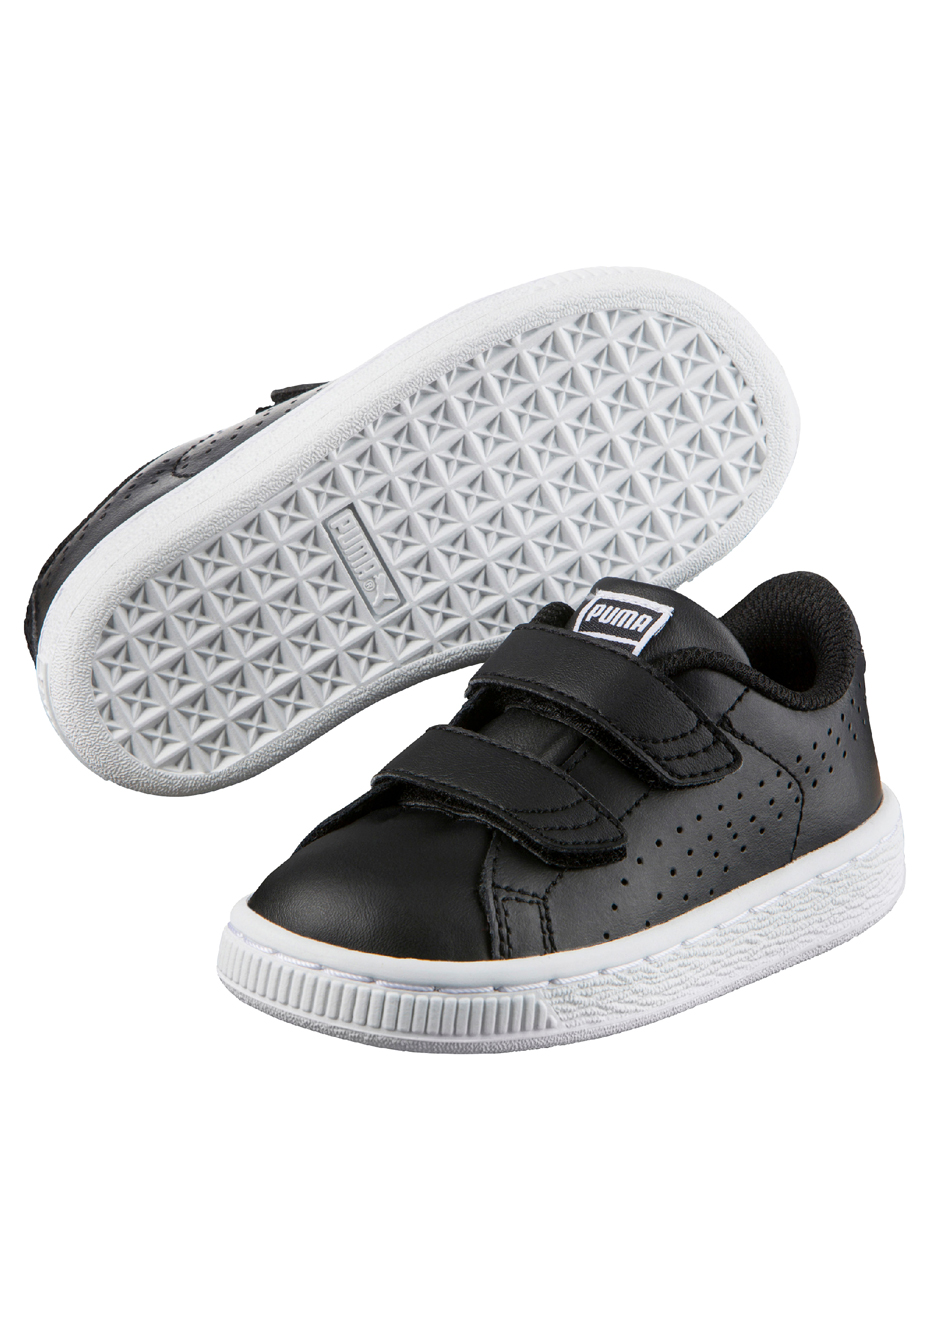 amp;w Black Classic Velcro Infant Puma Basket B 9WDEH2IY